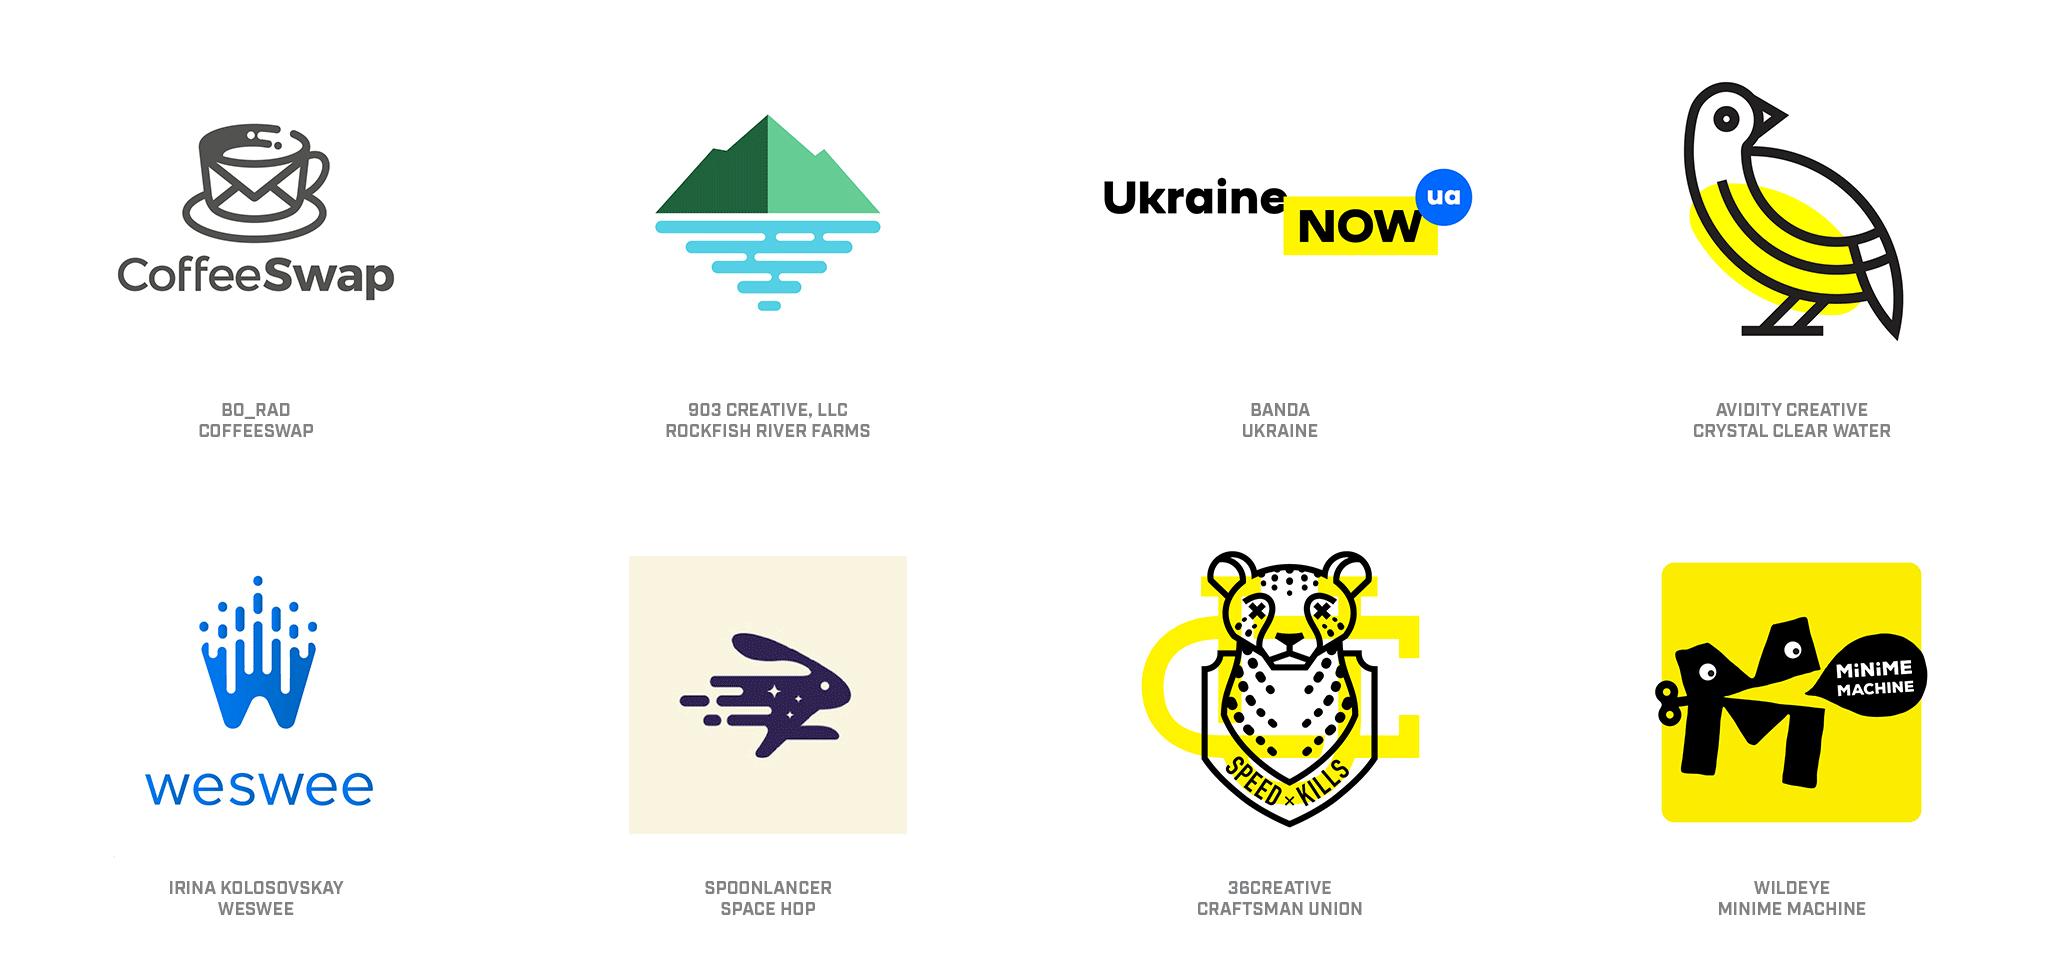 2019 LogoLounge Trends